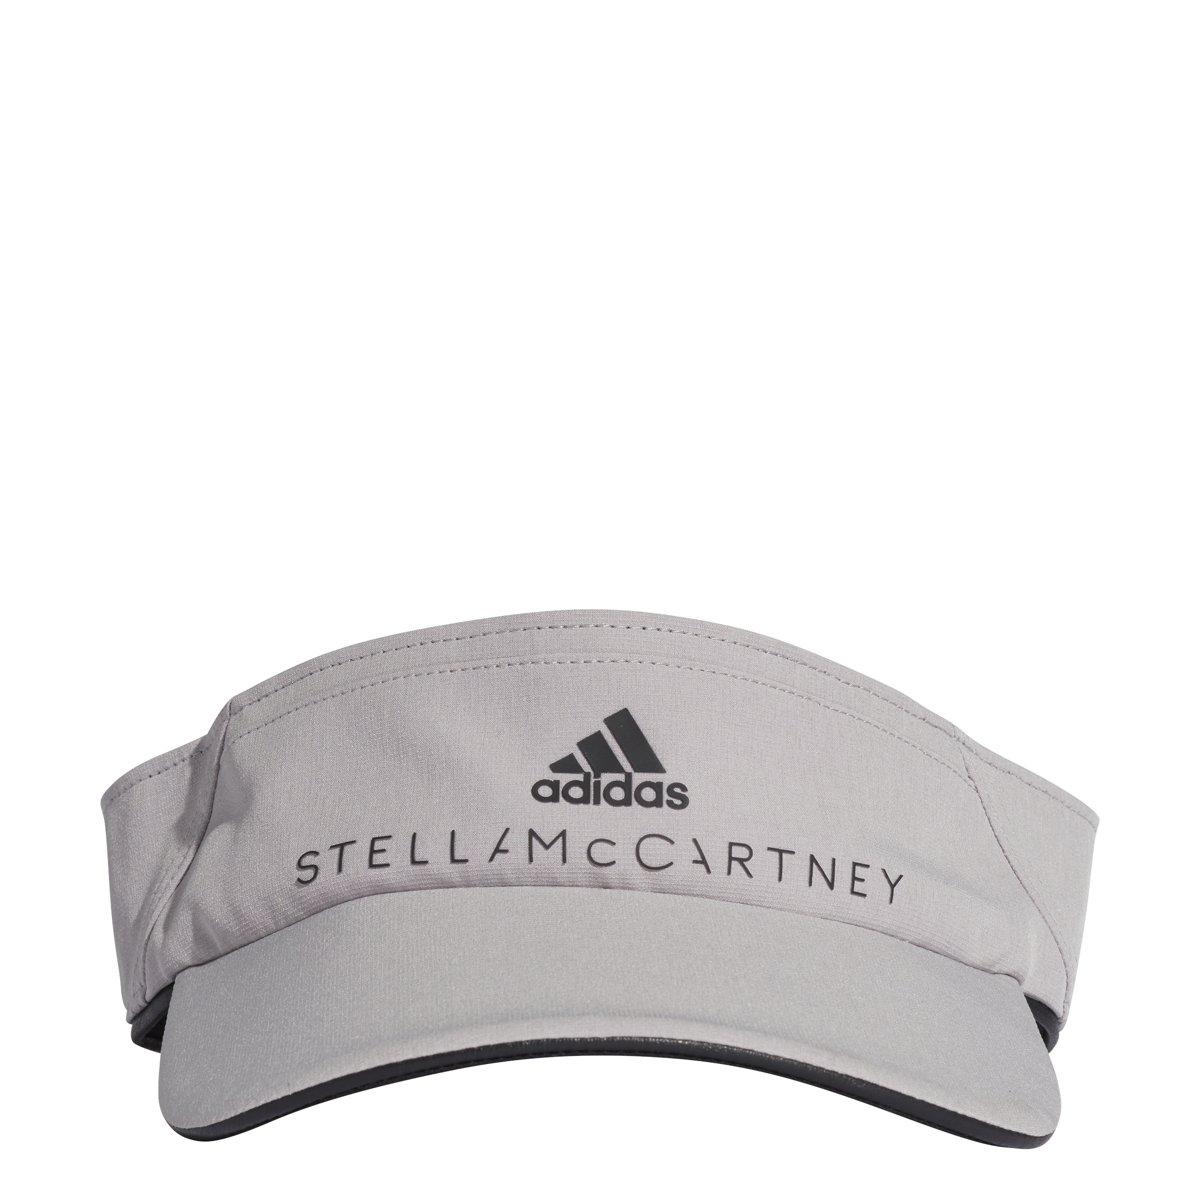 adidas by Stella McCartney Women's Cotton Visor, Pearl Grey, One Size